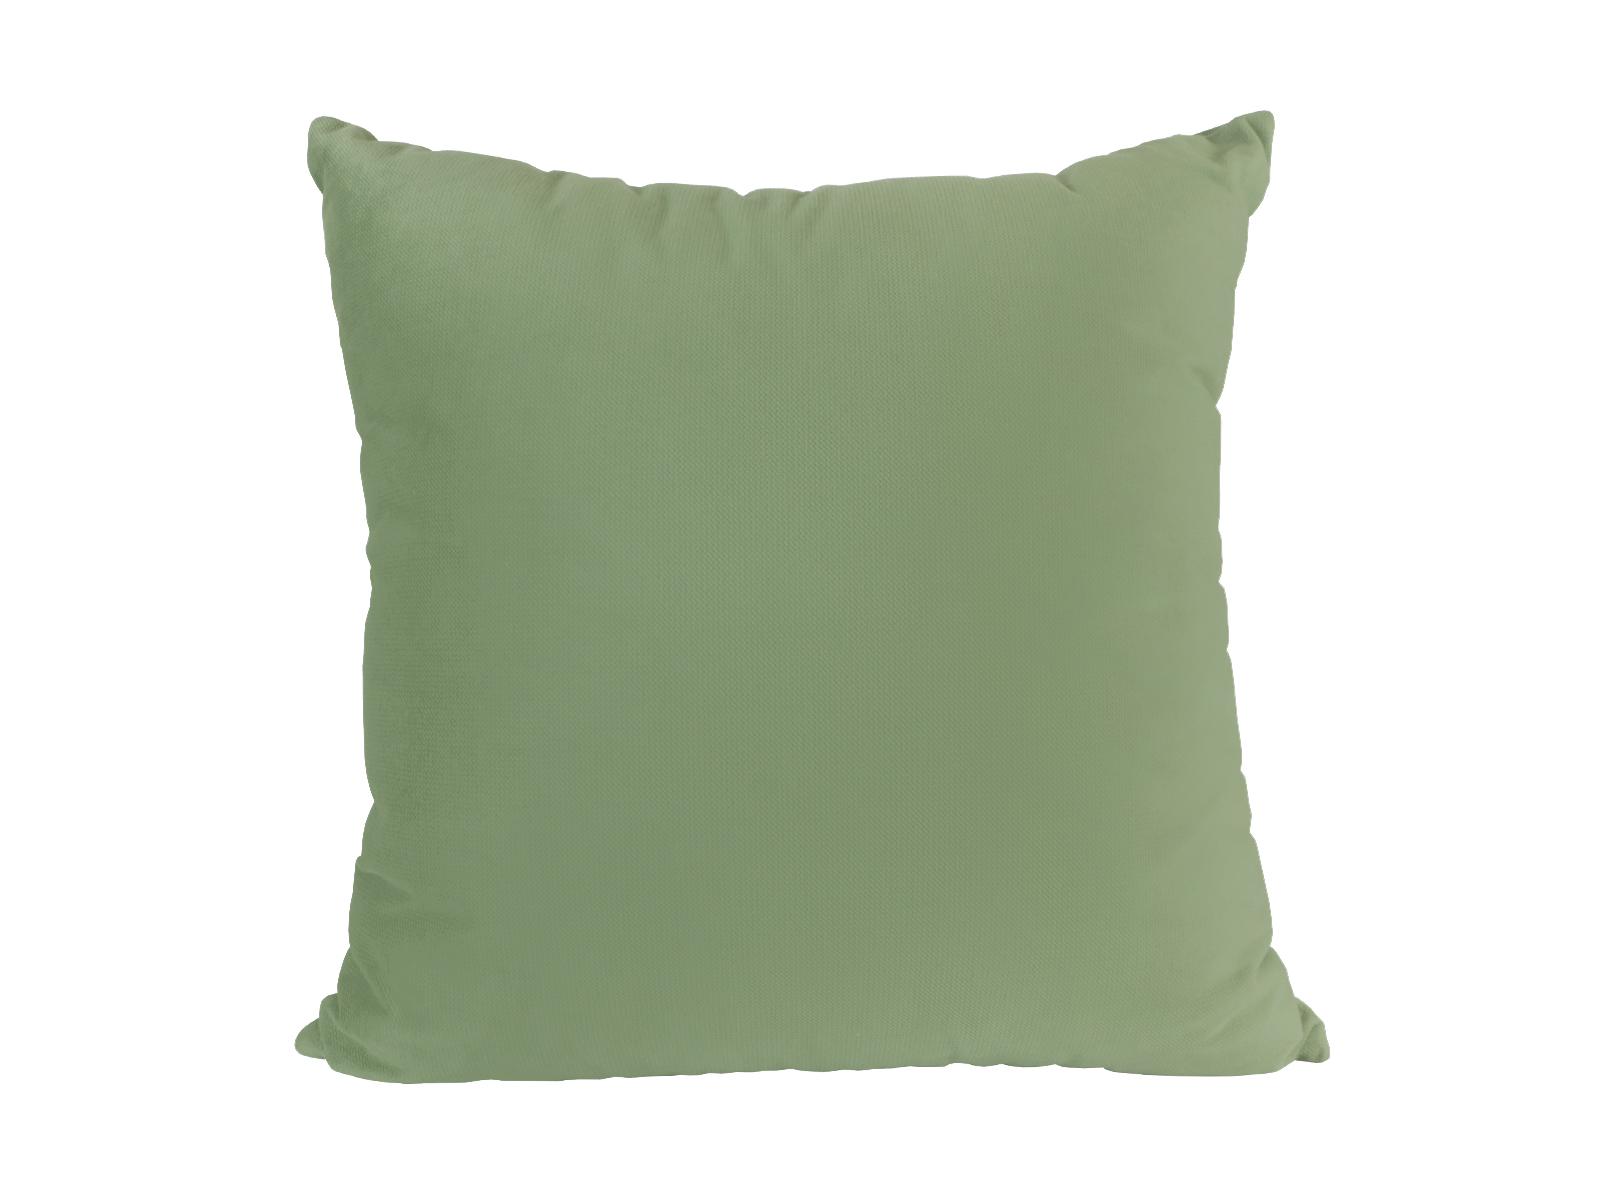 Подушка California Ekart Tango Green ОГОГО Обстановочка!